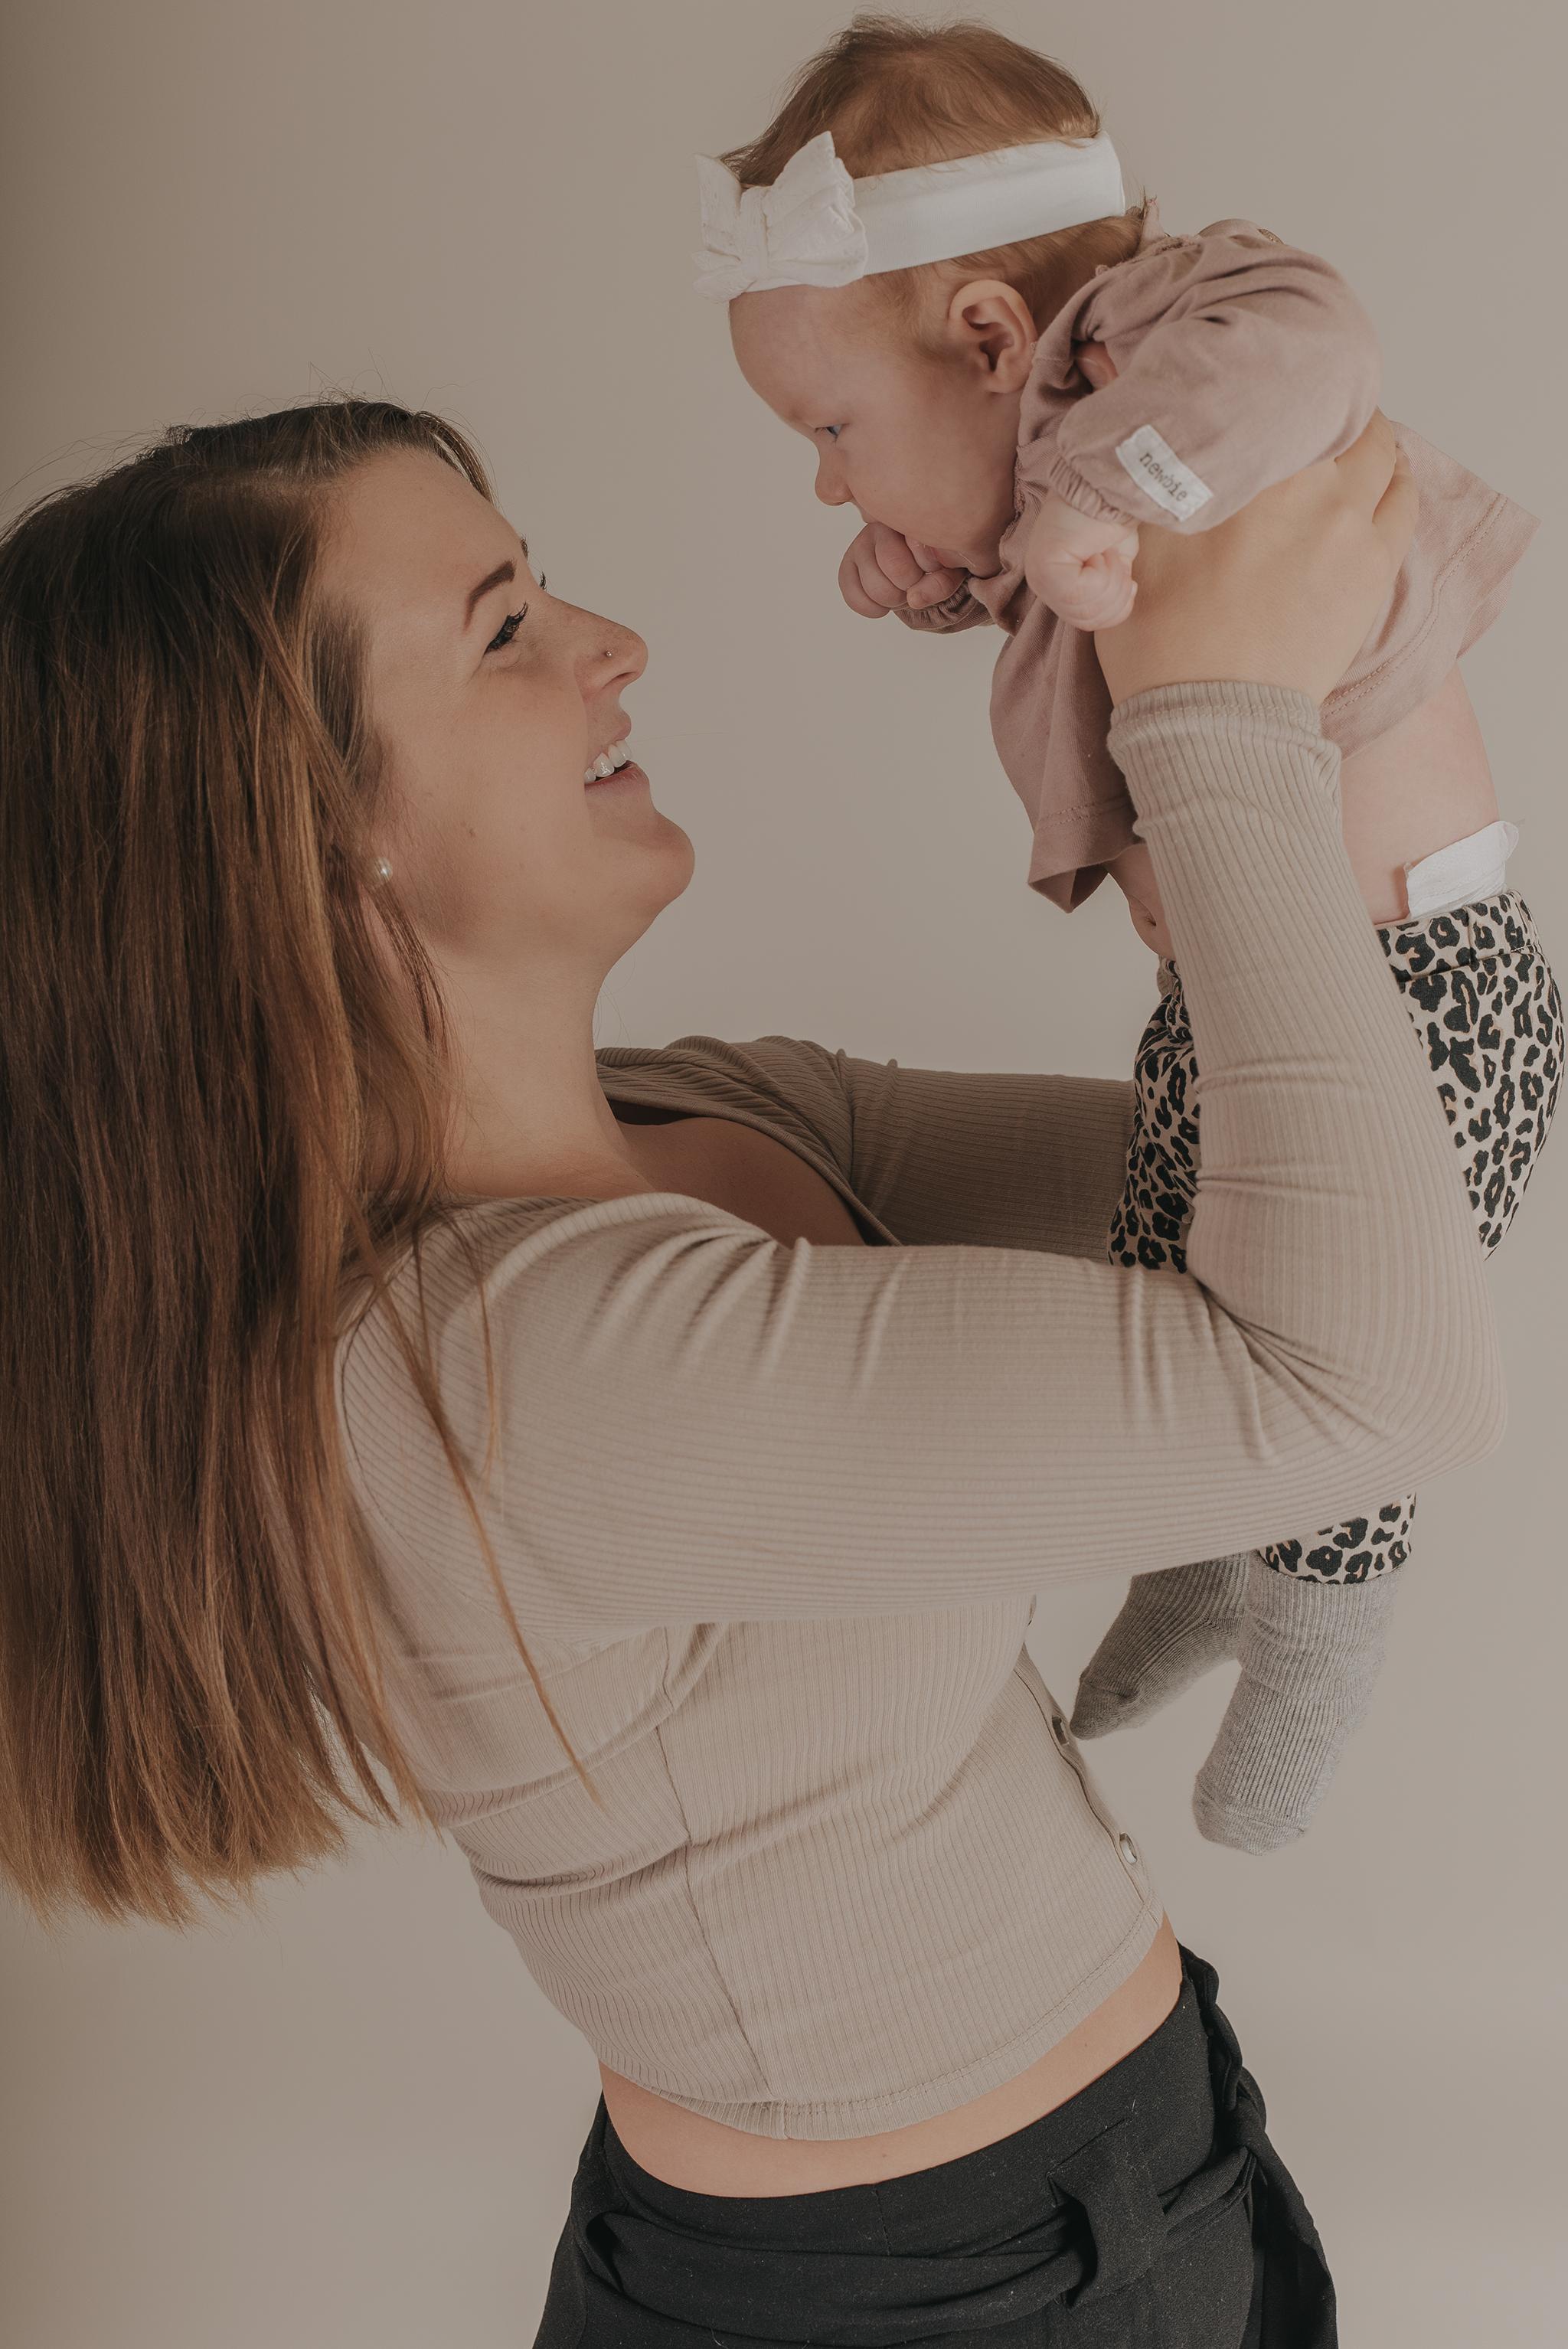 FamiljefotograferingFotograf Nathalie Nyberg webb 0003.jpg